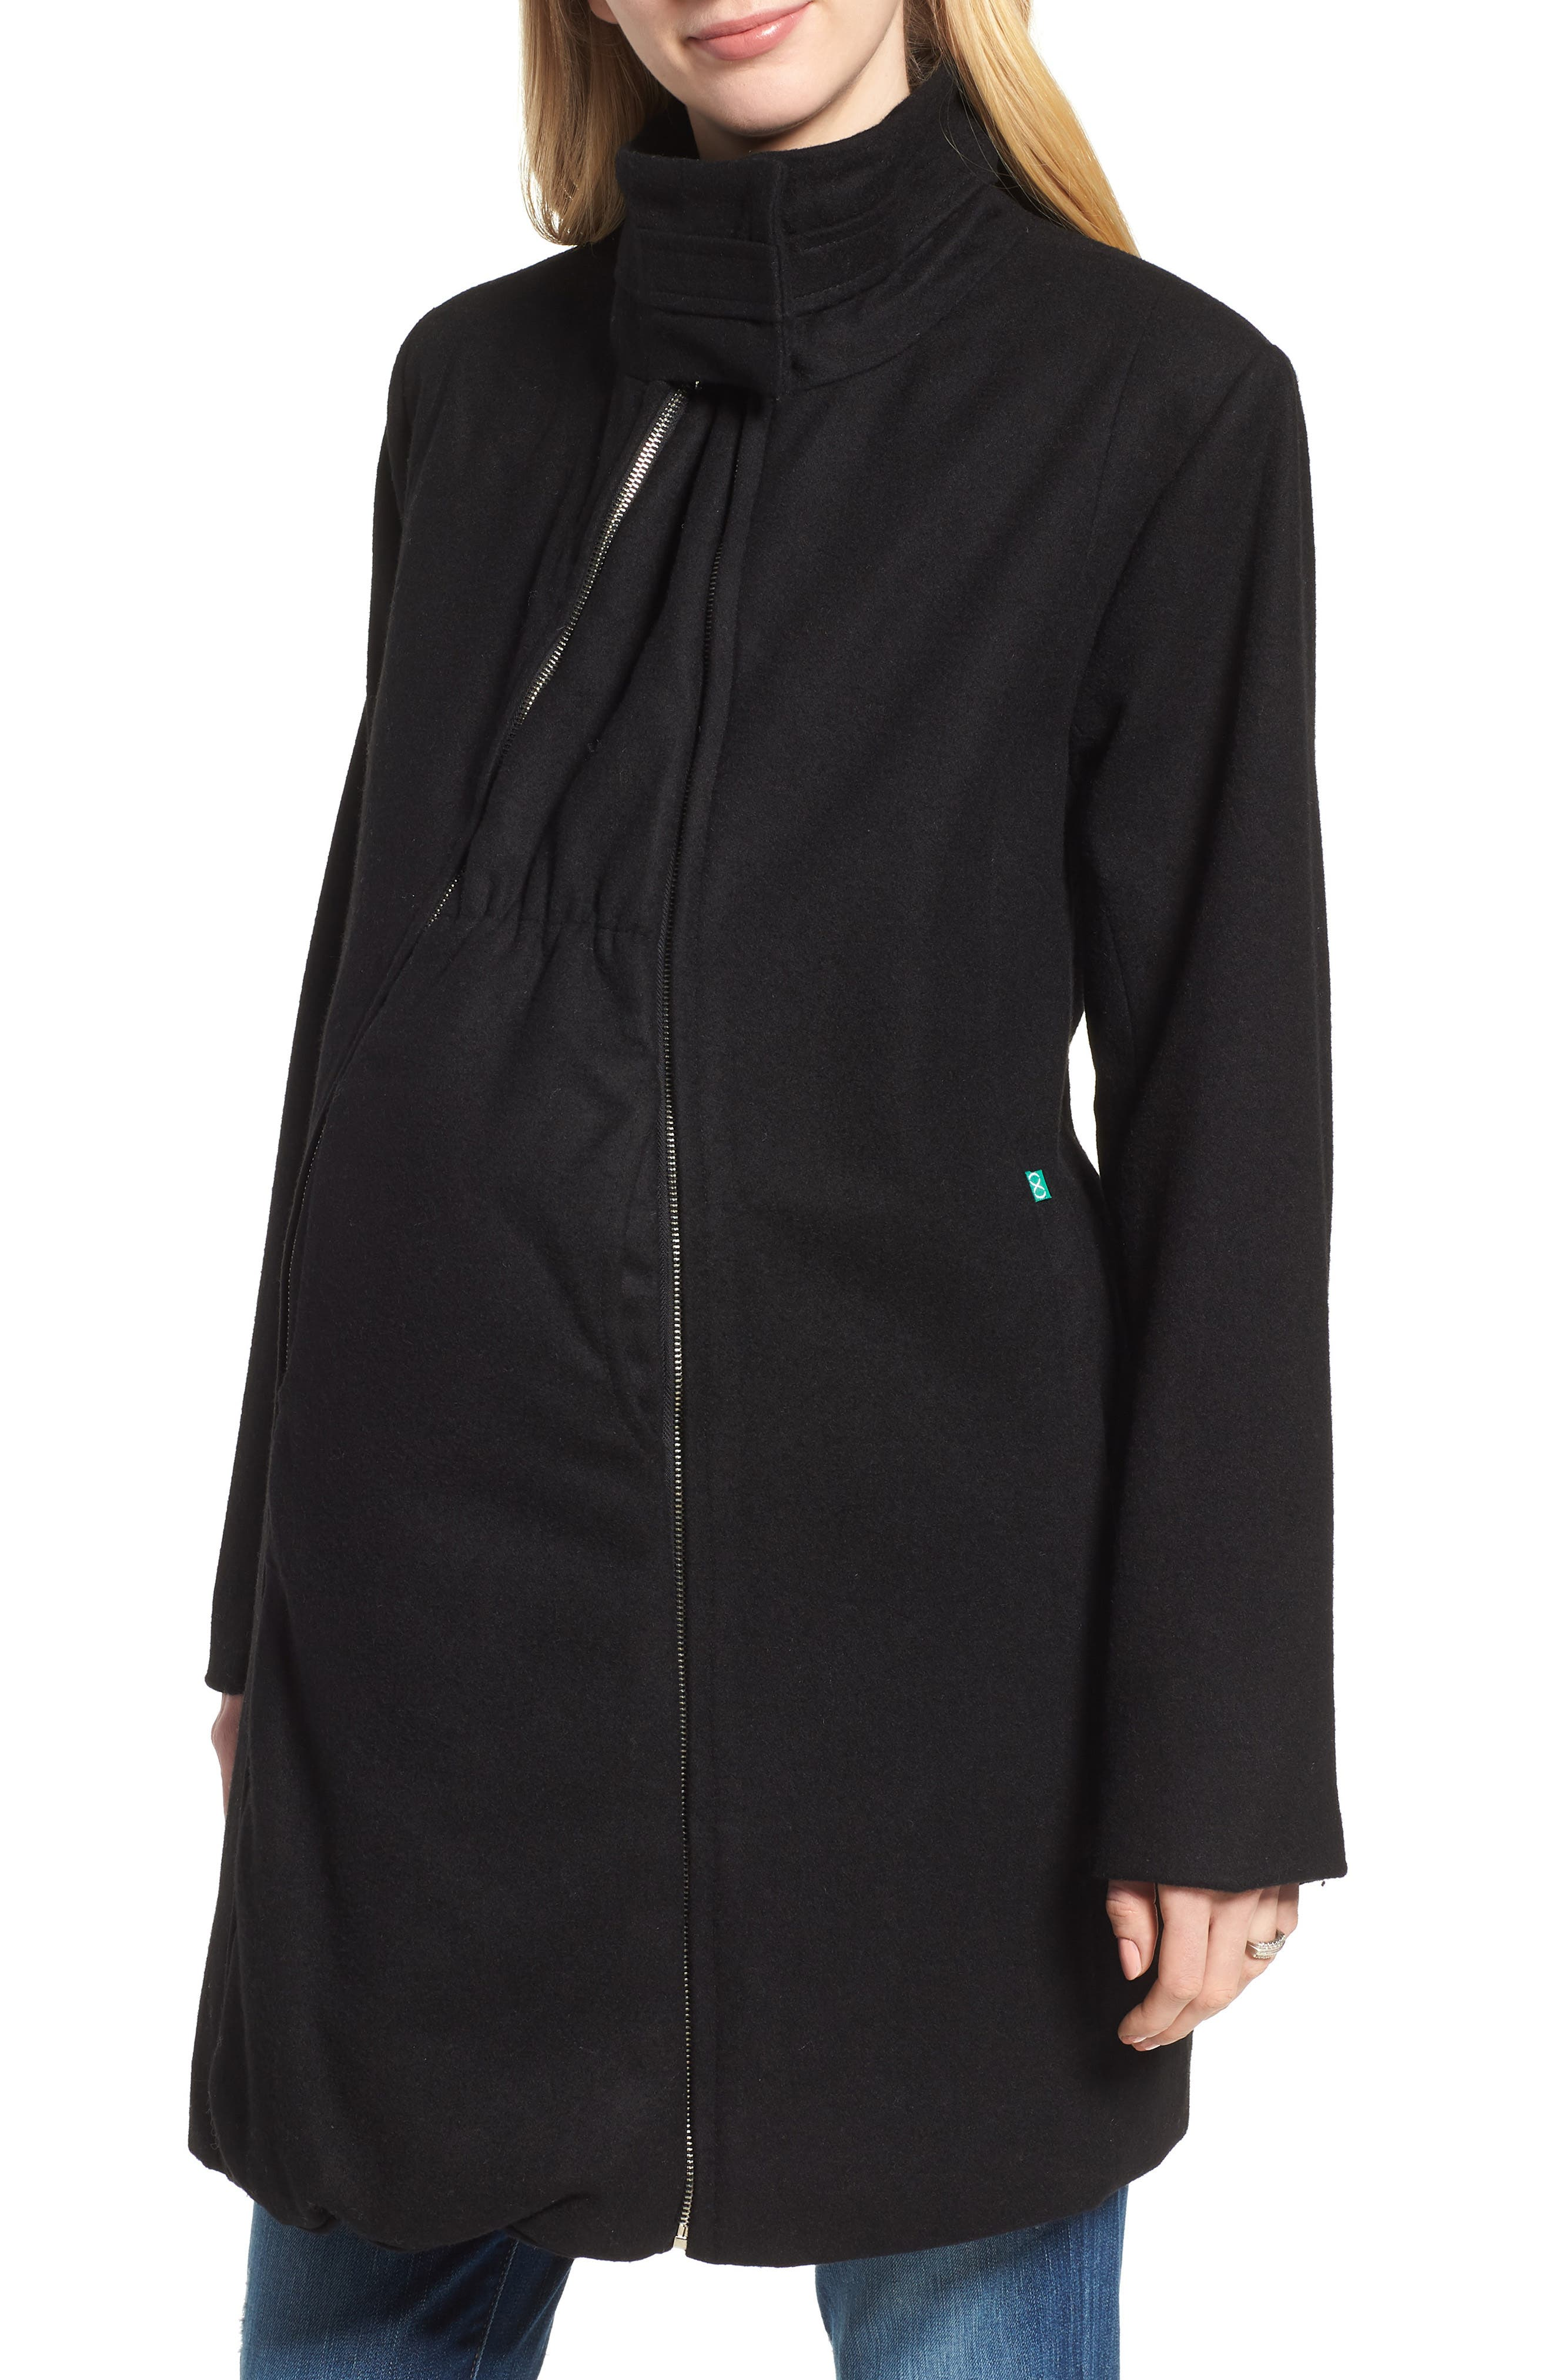 MODERN ETERNITY Convertible 3-in-1 Maternity/Nursing Coat, Main, color, BLACK